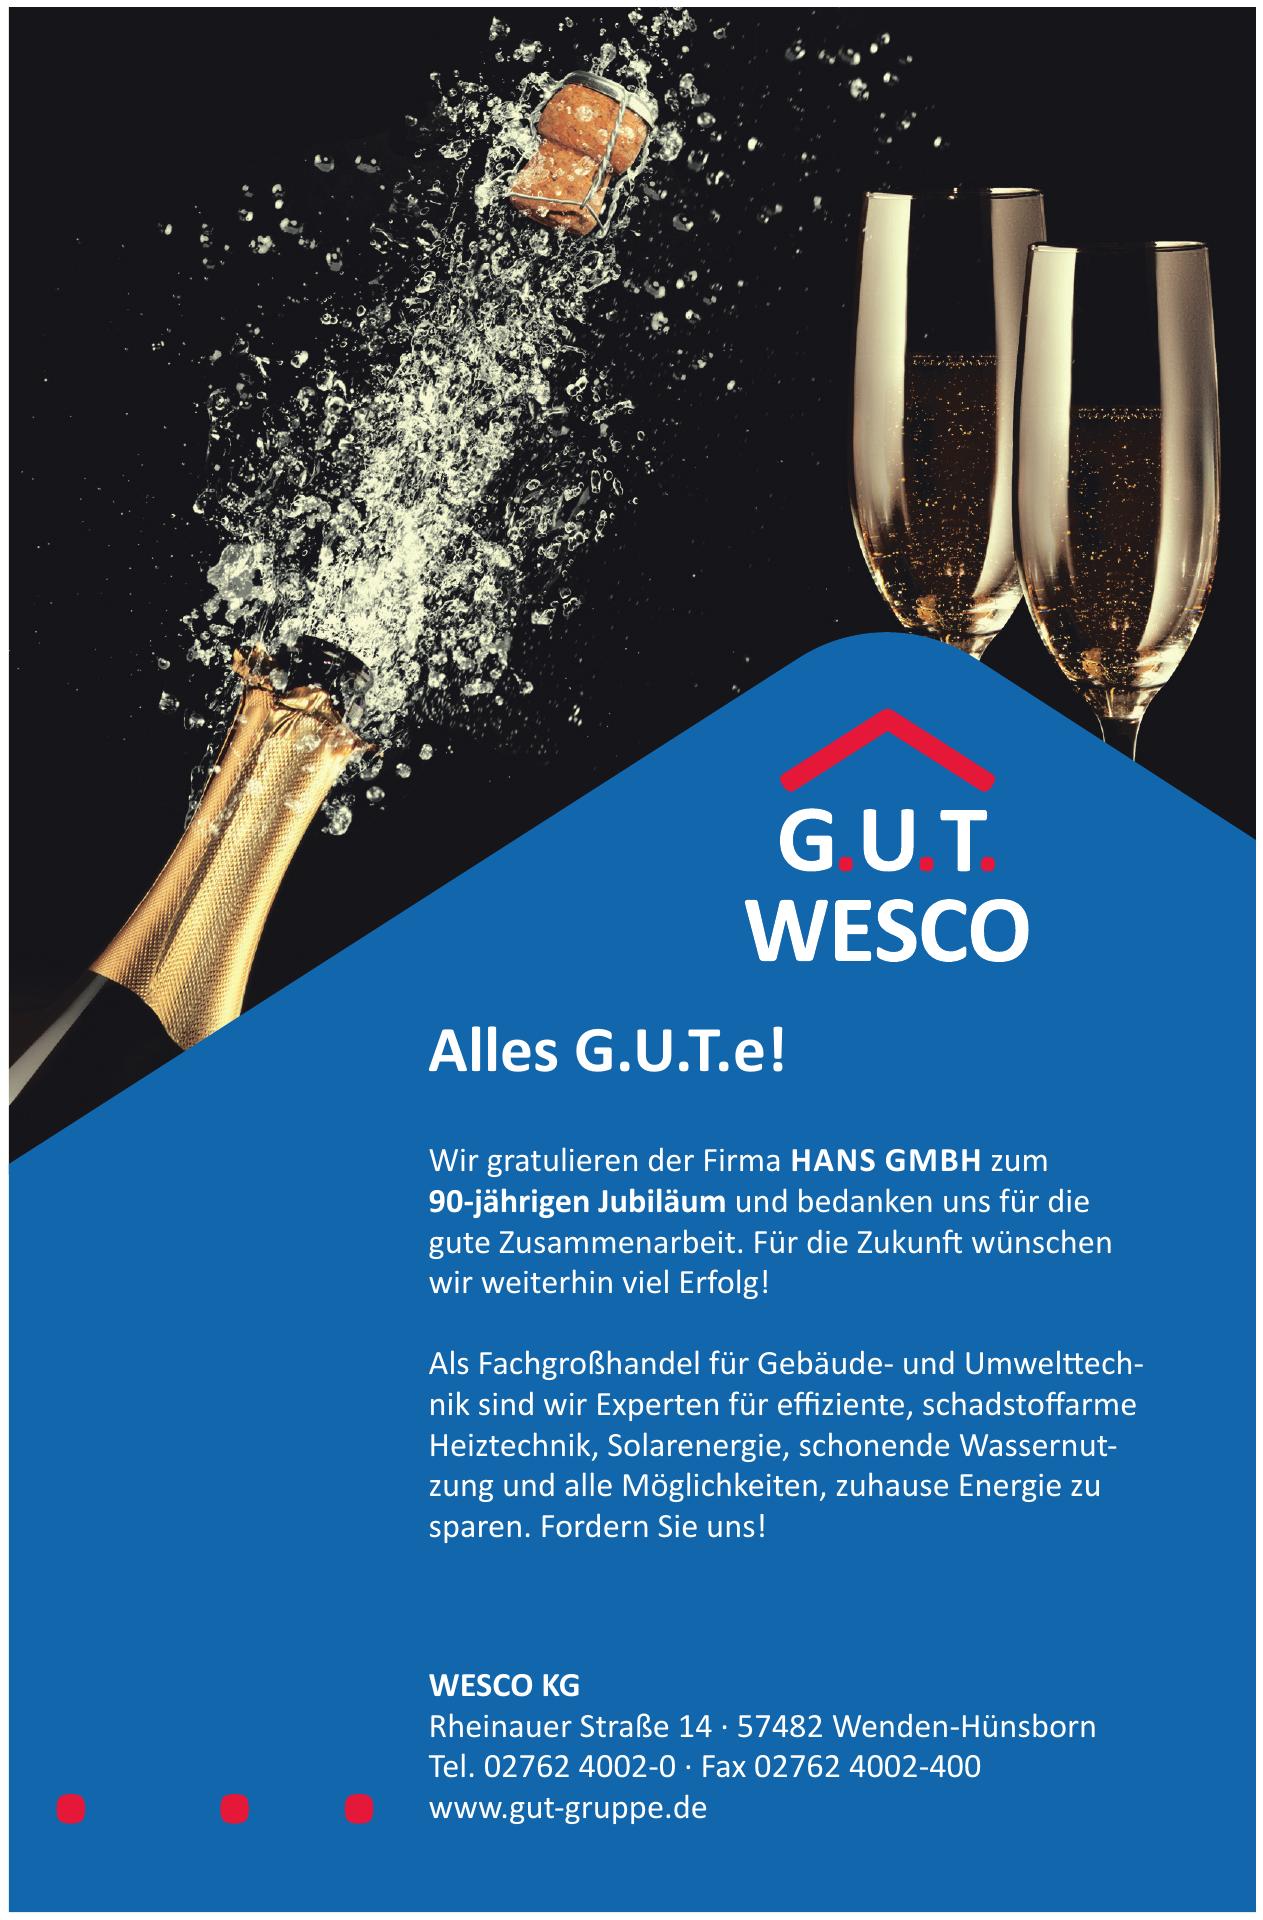 WESCO KG